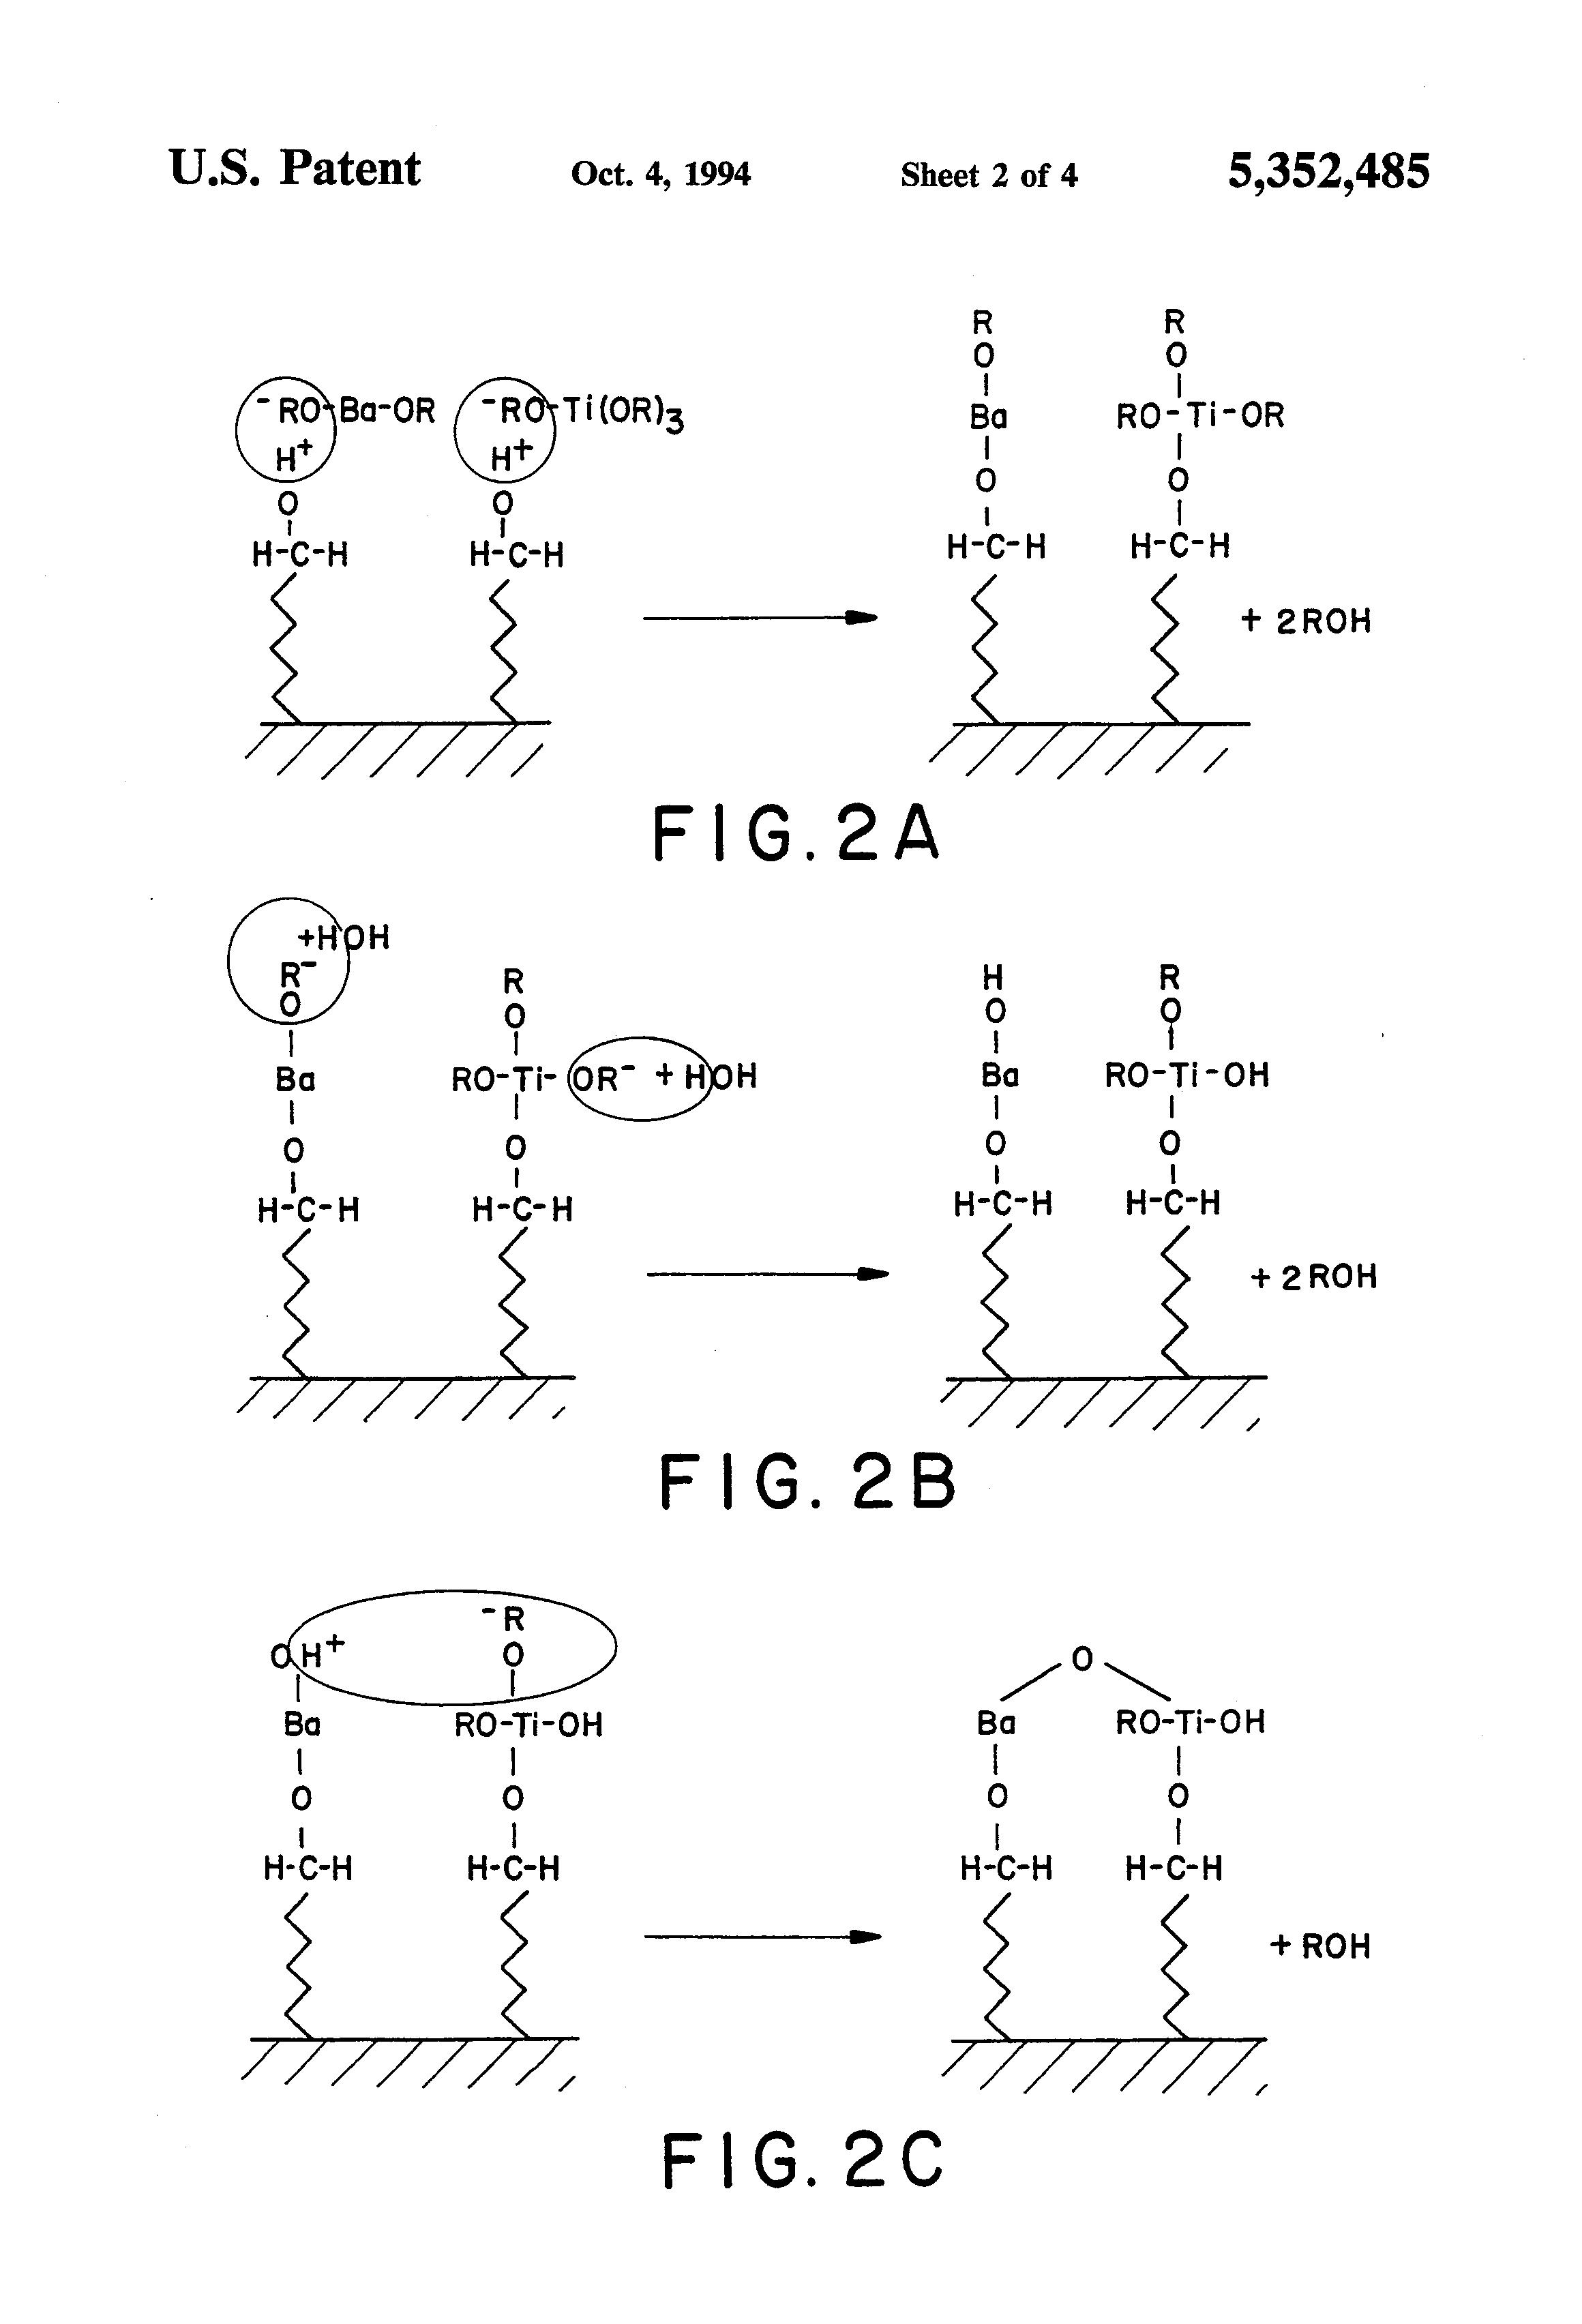 Sgu.ac.id thesis image 1